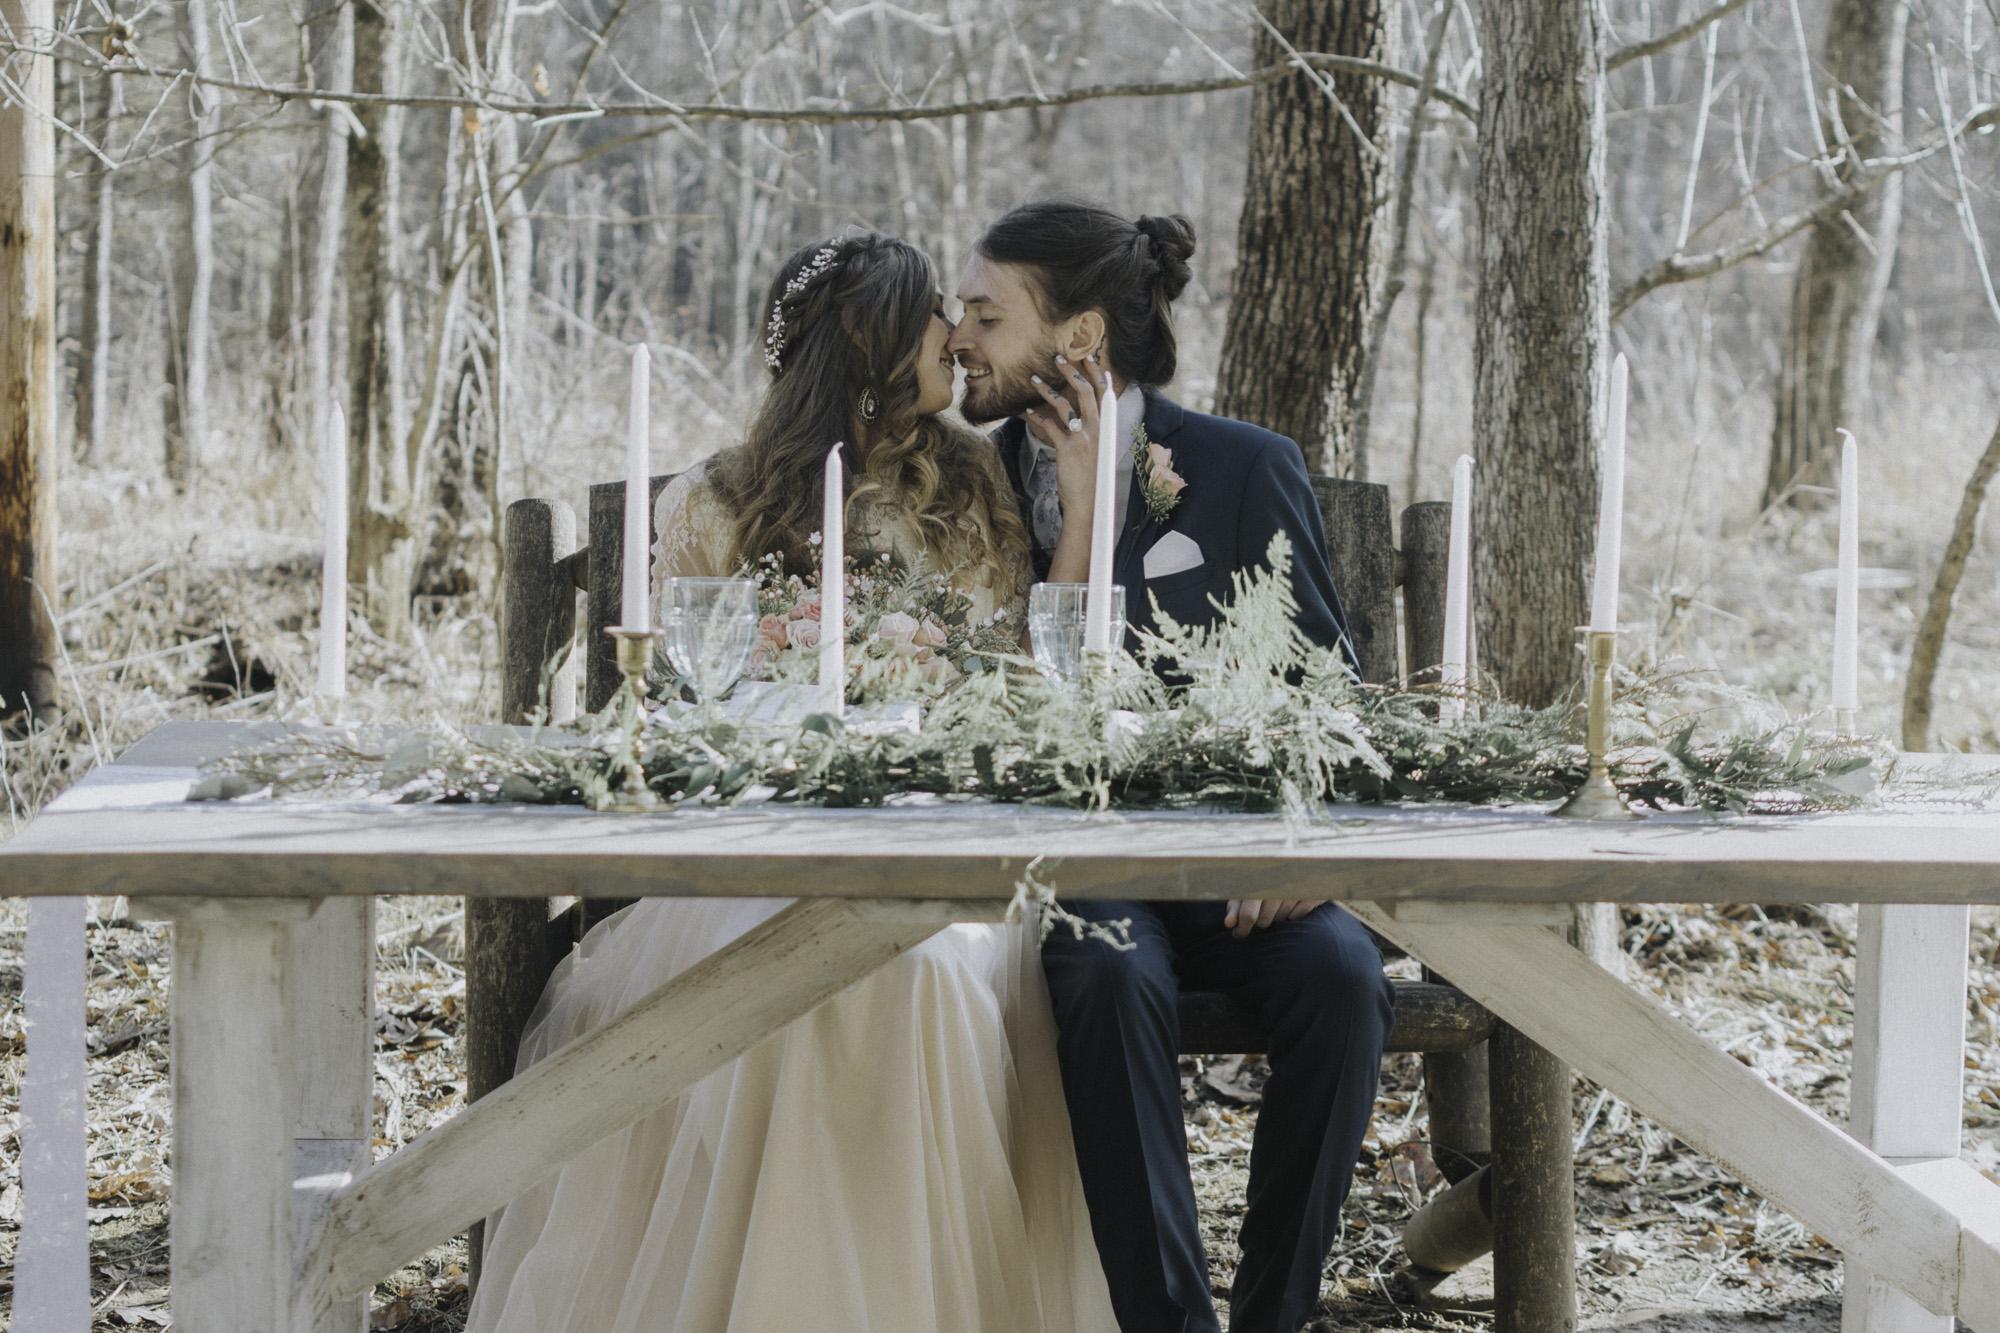 Cate_Ann_Photography_Dayton_Ohio_Wedding_Elopement_And_Engagement_PhotographerDSC_5783.jpg